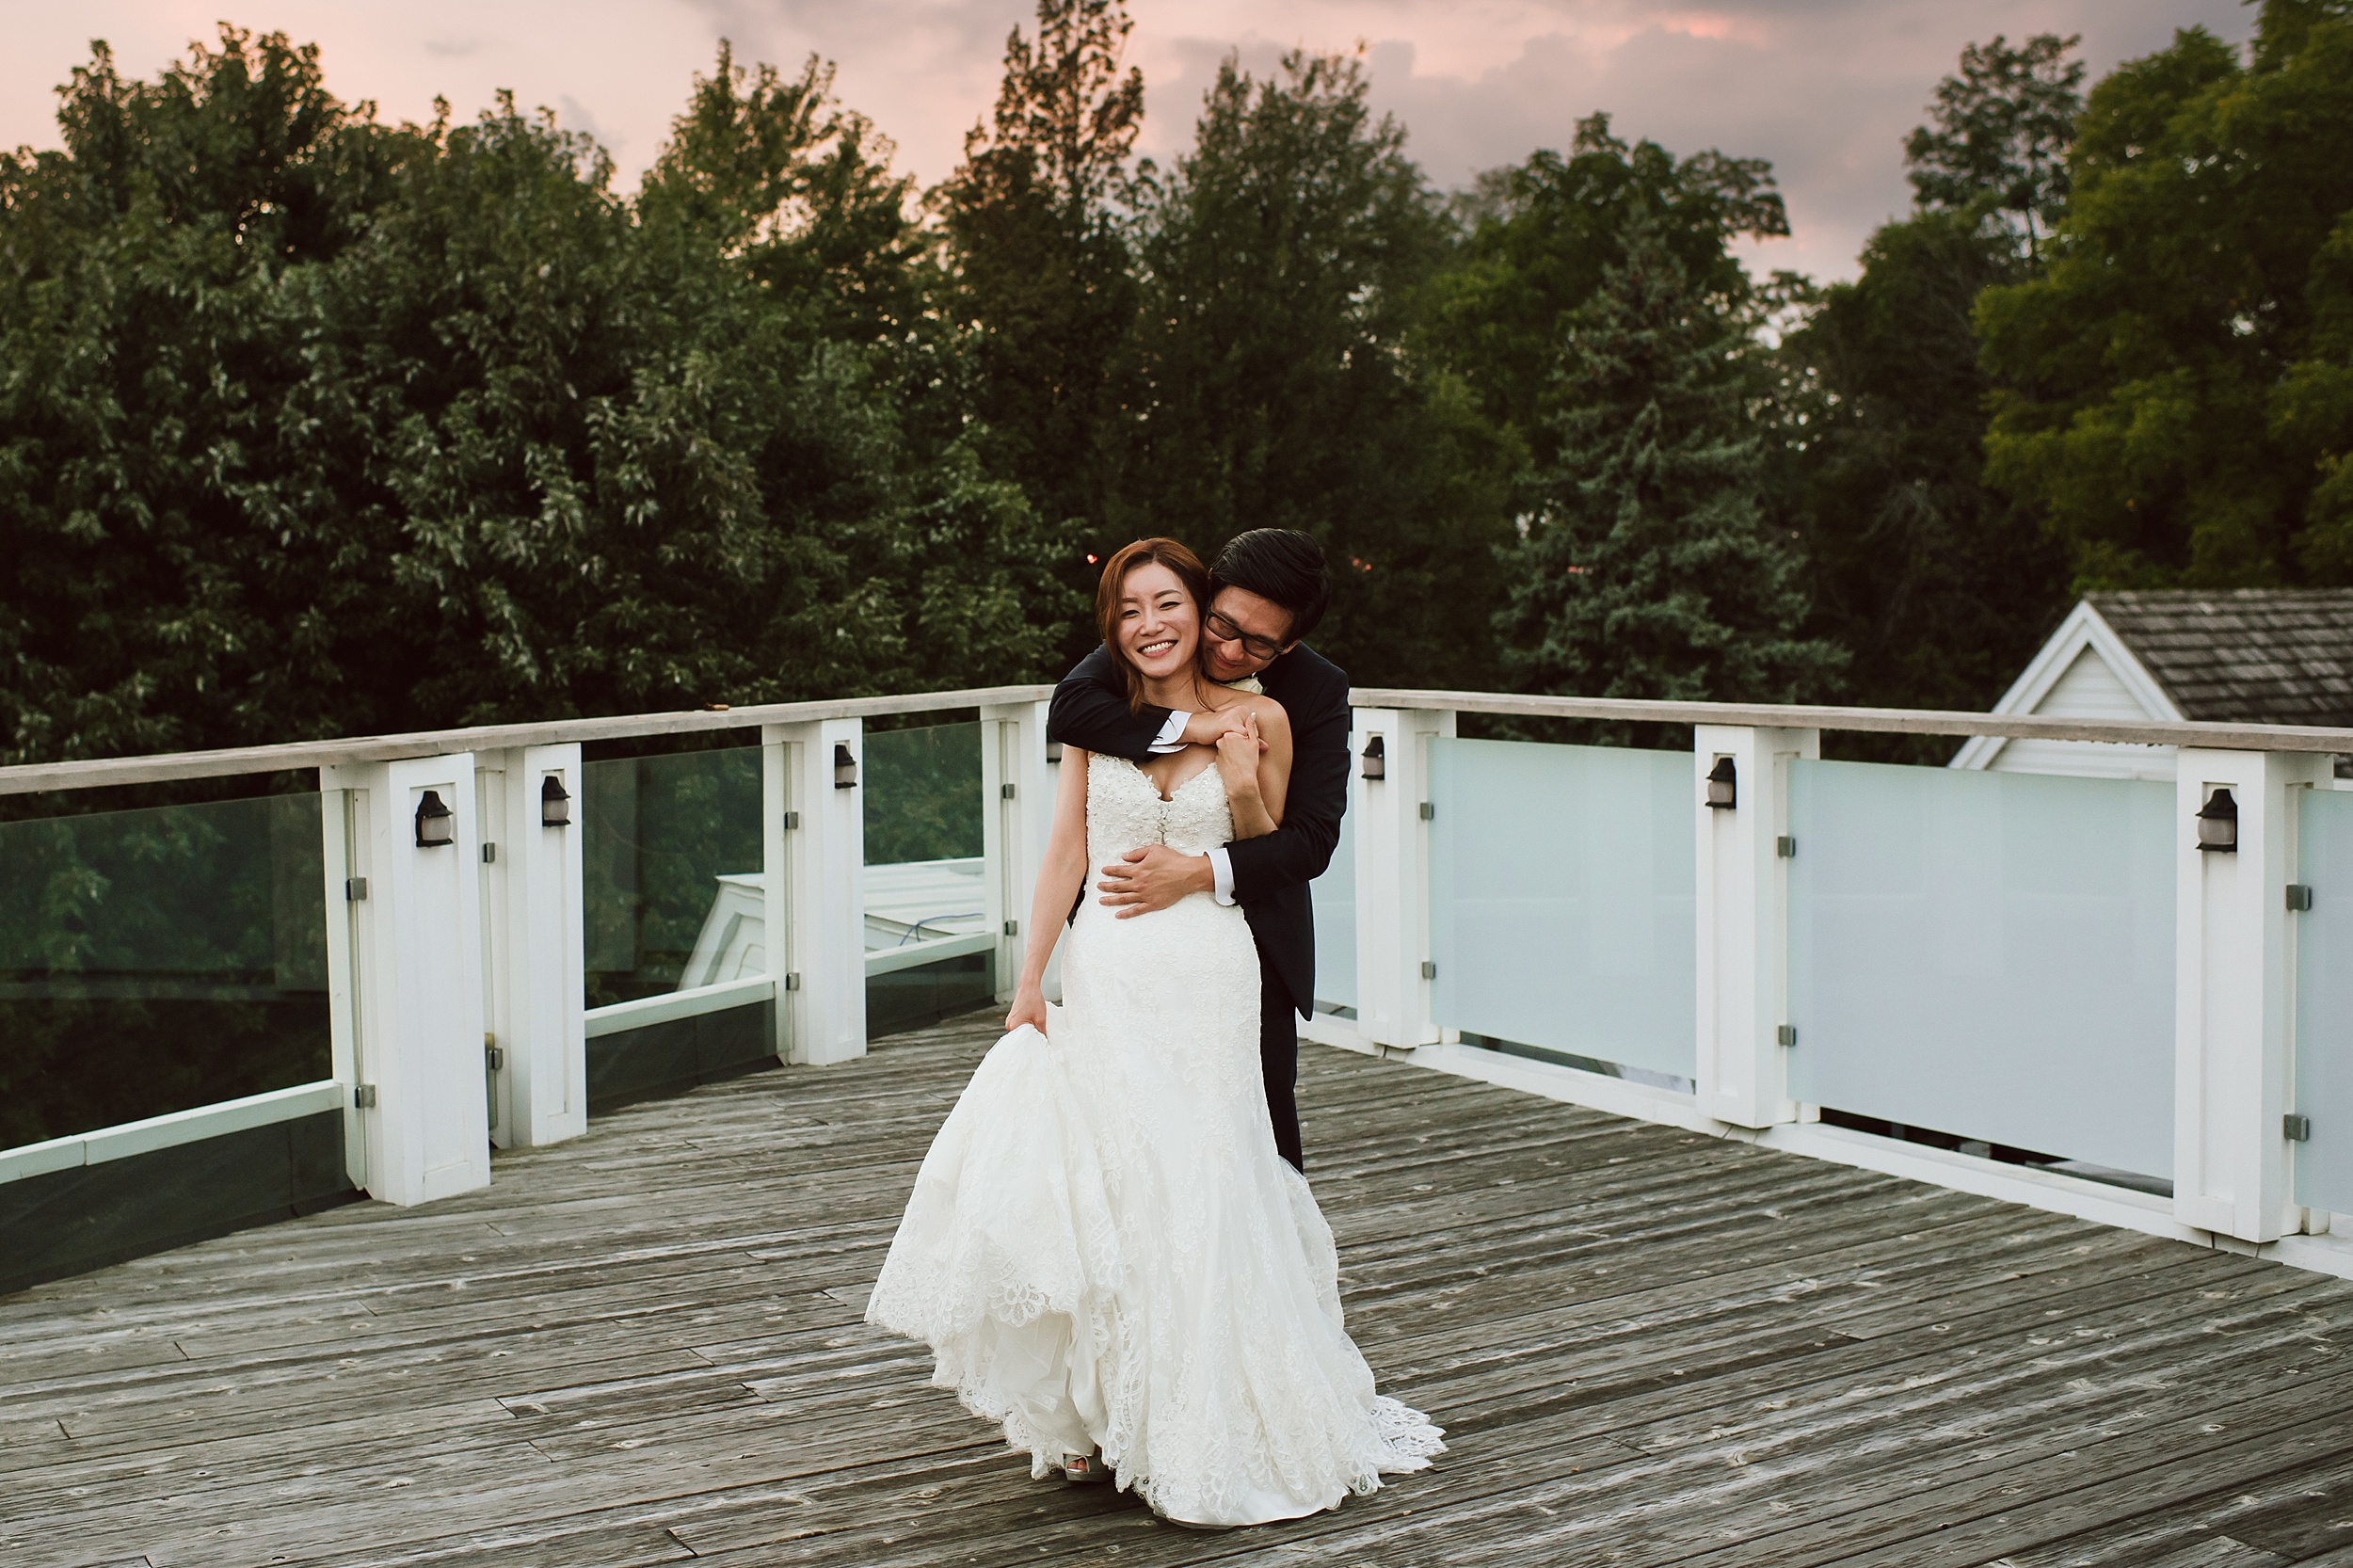 Doctors_House_Kleinburg_Wedding_Toronto_Photographer_0053.jpg